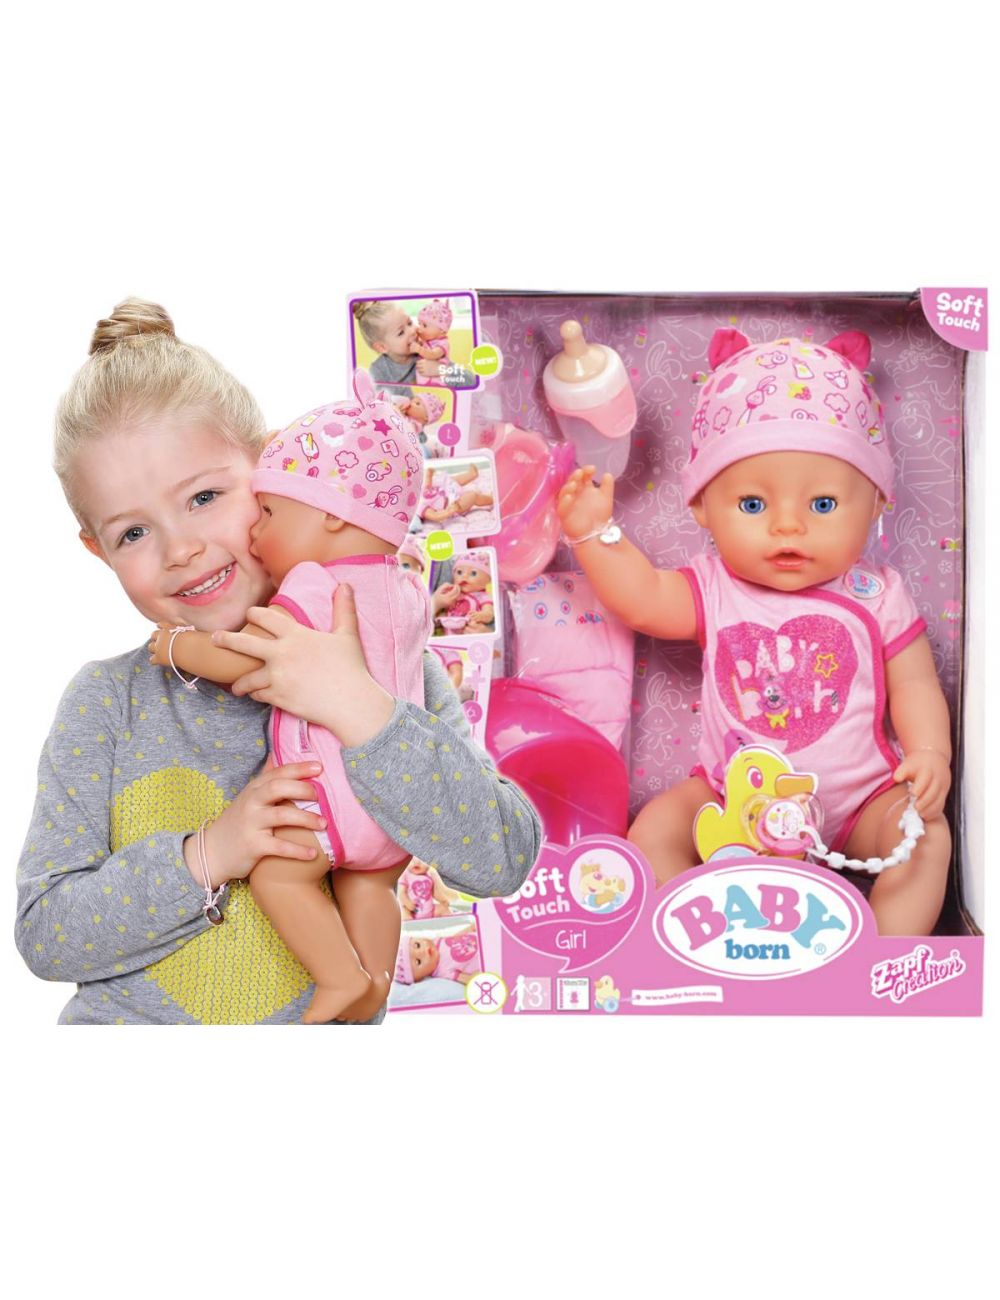 Baby Born Lalka Interaktywna Dziewczynka Soft Touch 824368